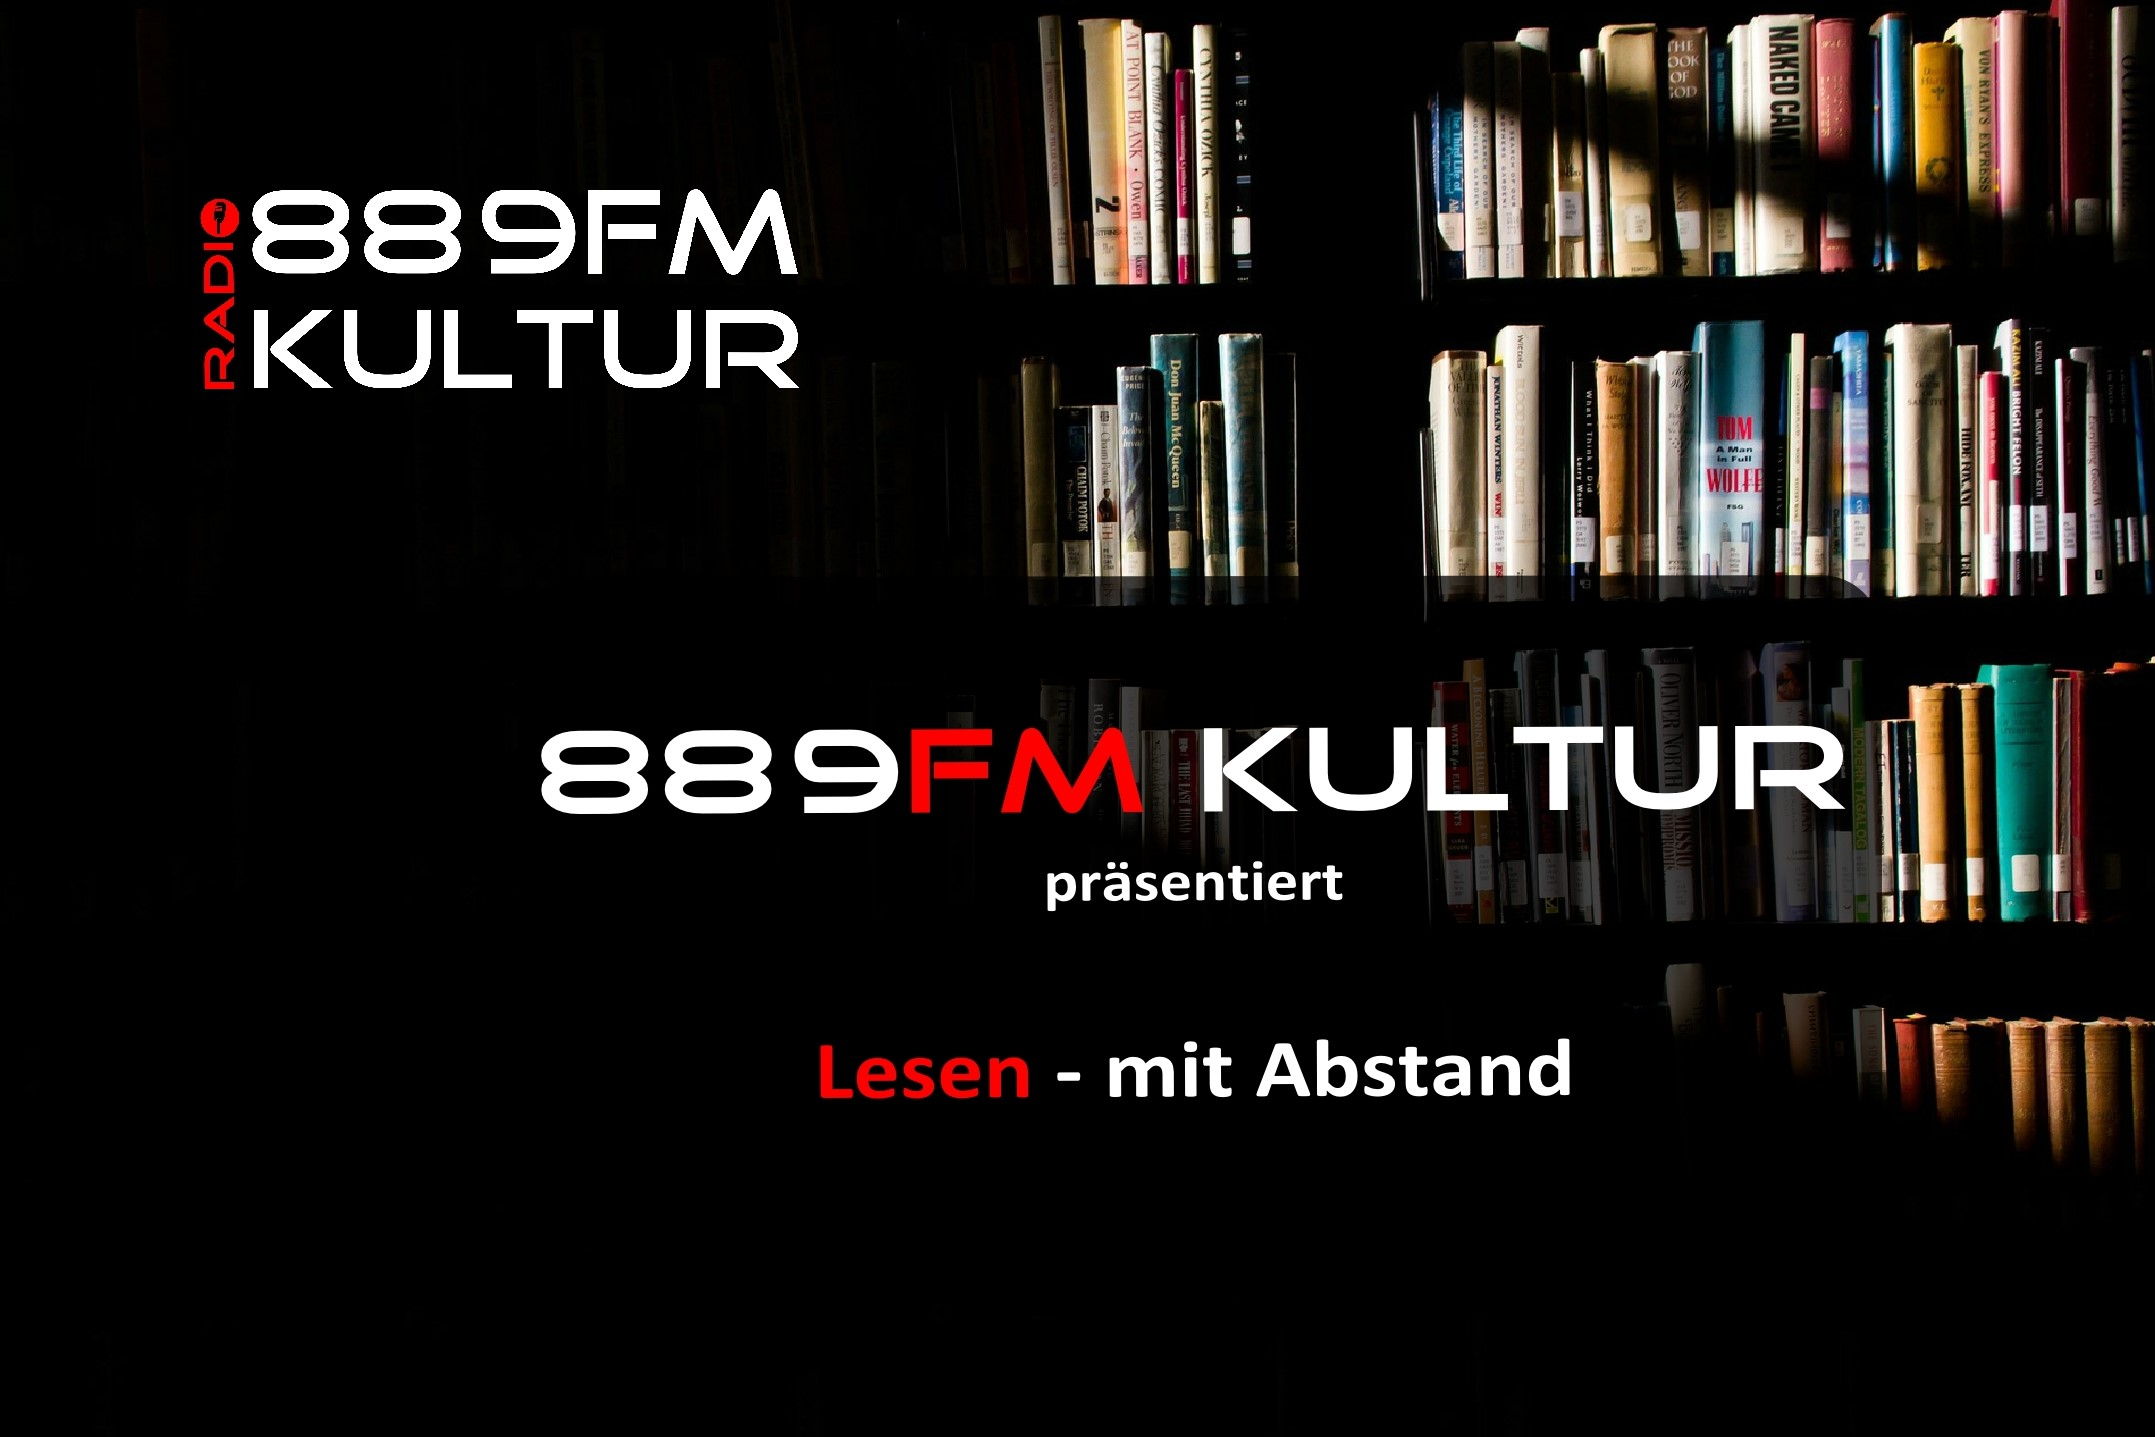 889FM Kultur, Radio 889FM Kultur